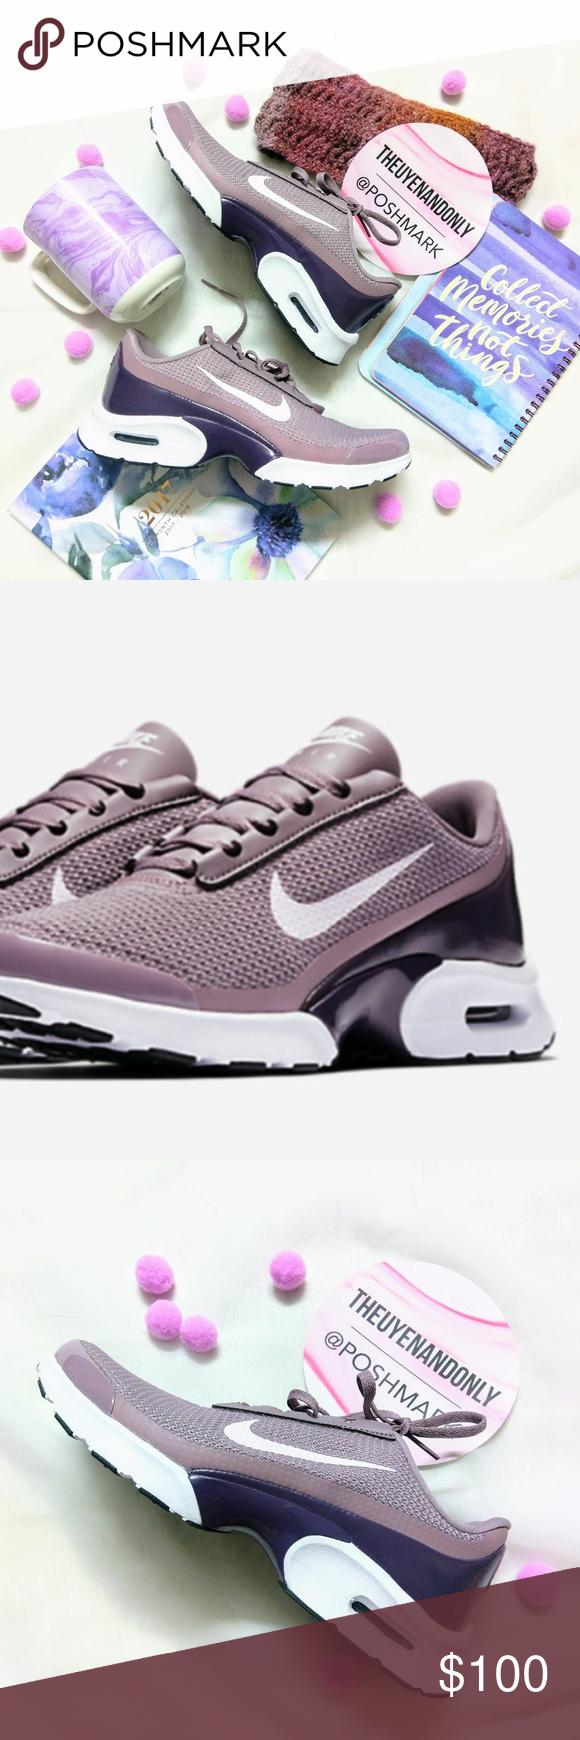 2238 Best Nike free runs images in 2019 | Nike free, Nike